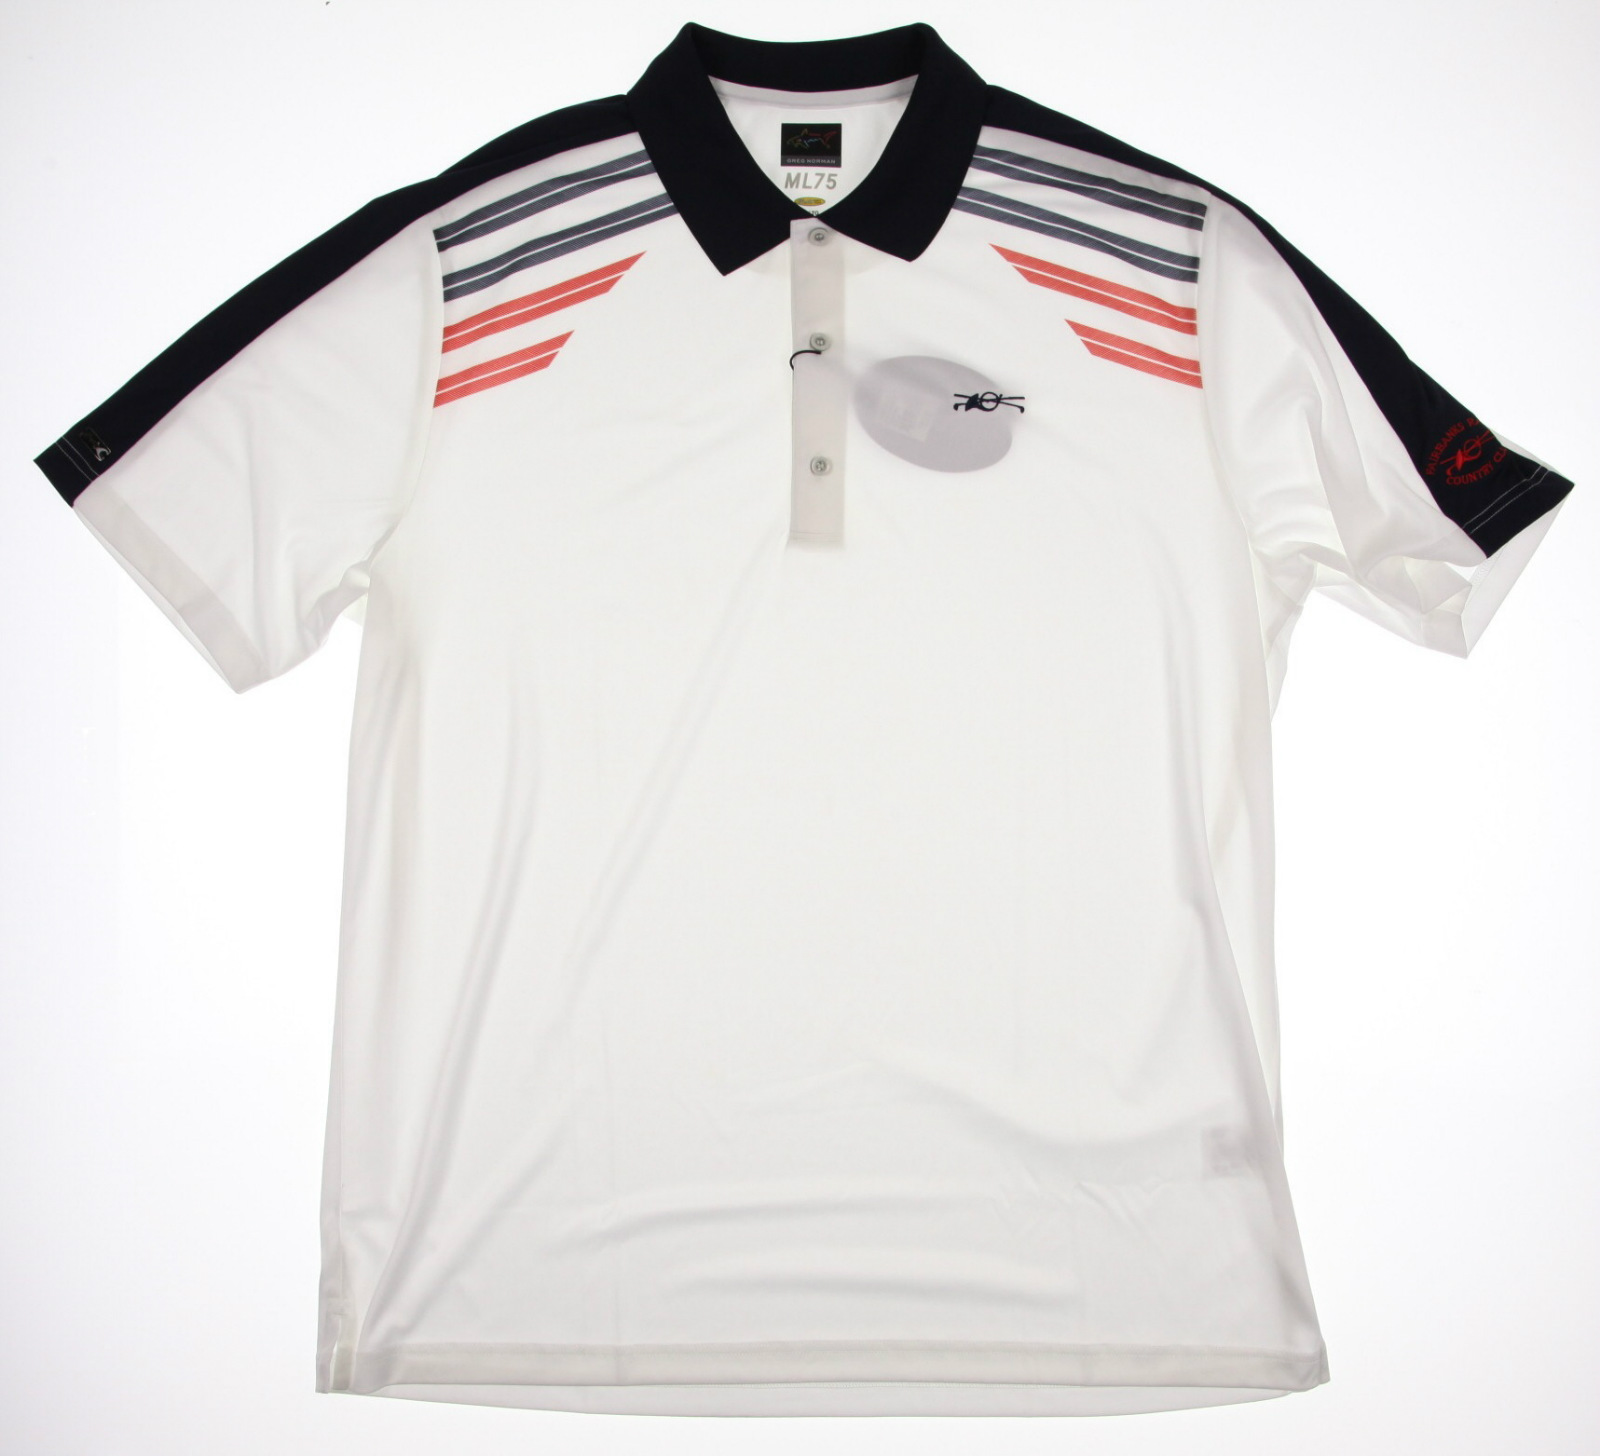 New men 39 s greg norman ml75 play dry golf polo shirt white for Greg norman ml75 shirts